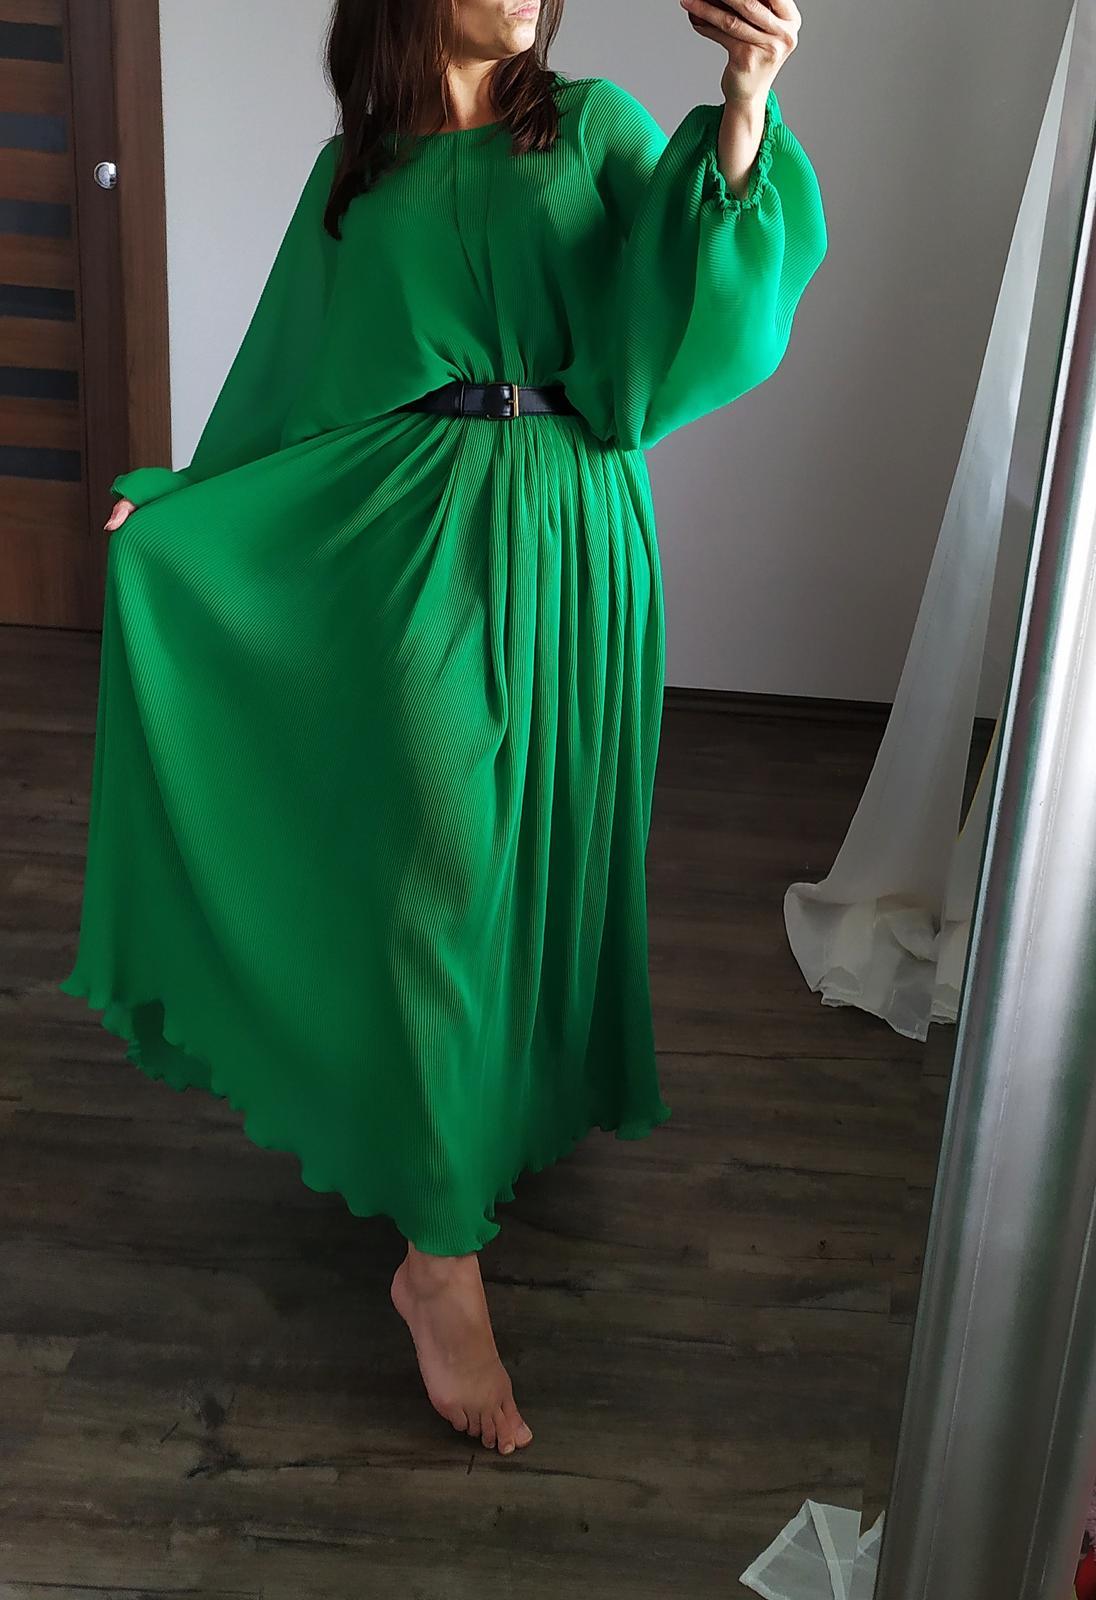 šaty Zara XS-S - Obrázek č. 4